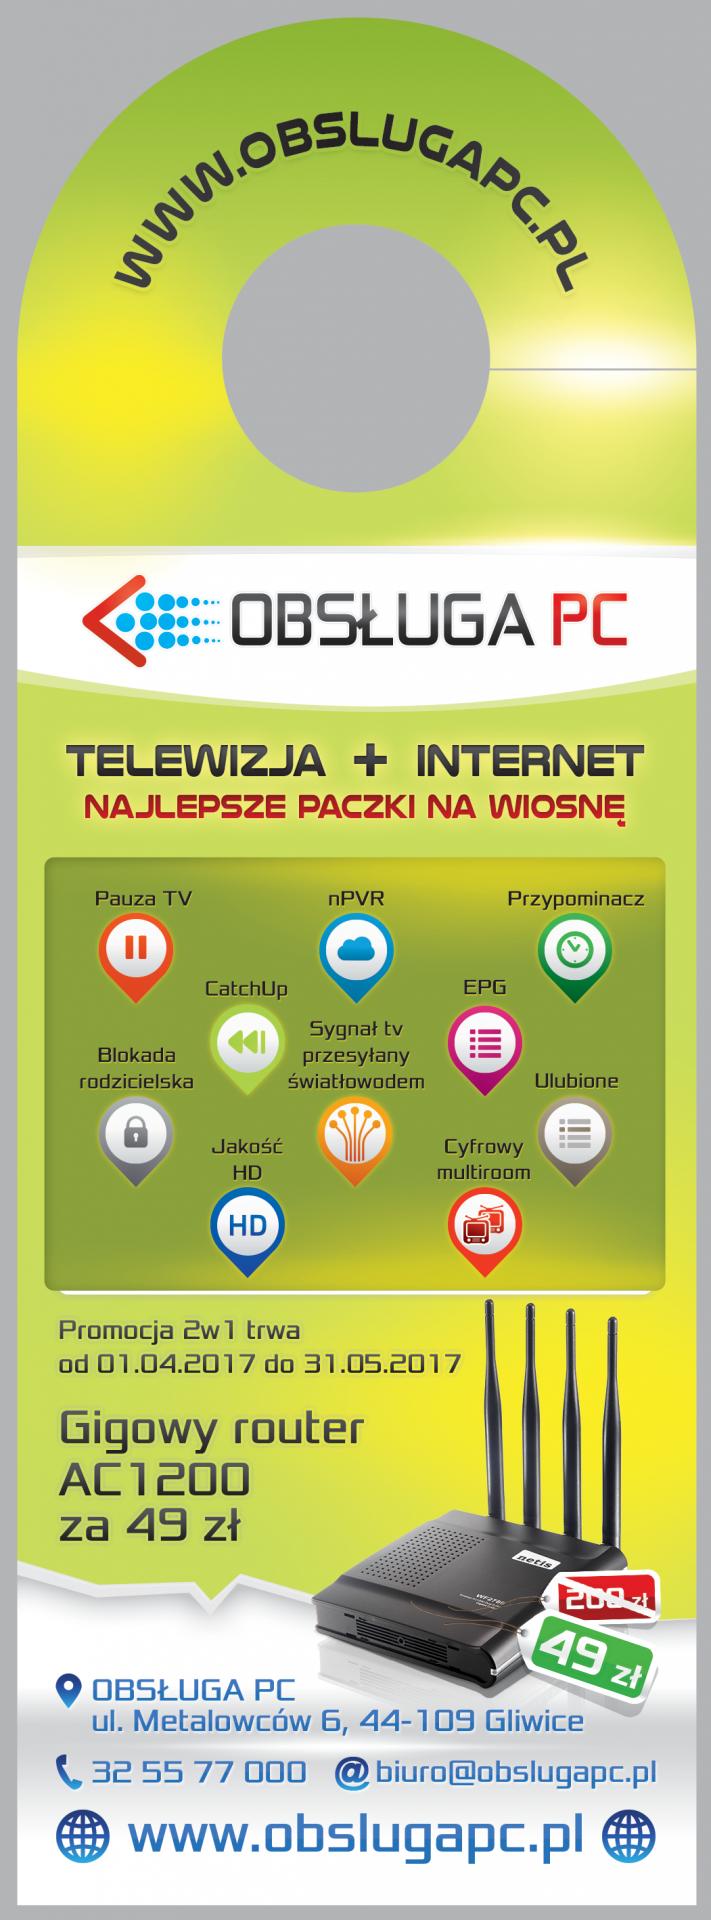 Obsługa PC - Vorenus Agencja Interaktywna